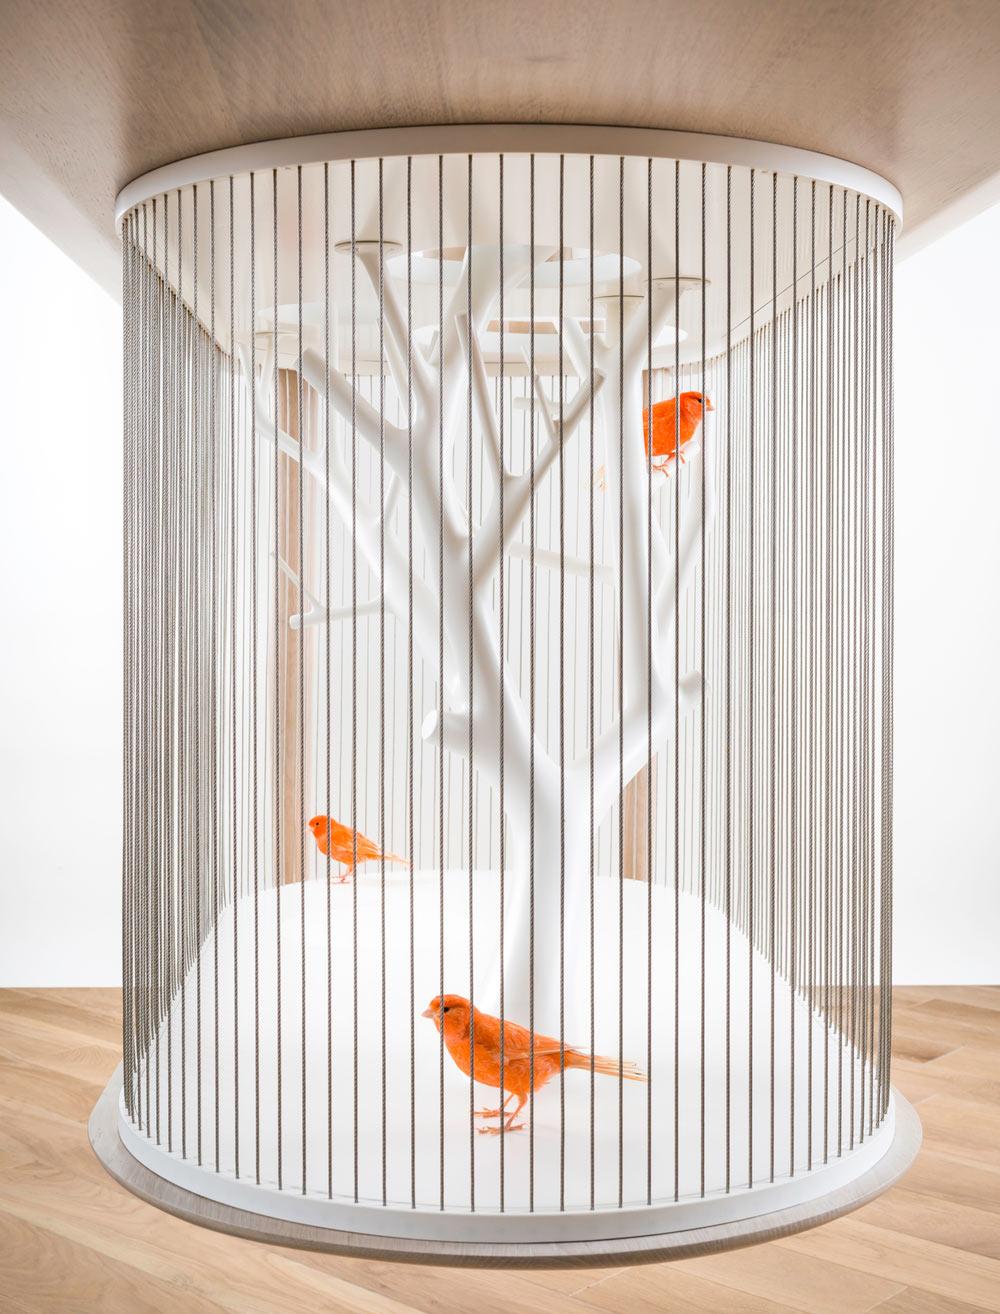 birdcage-table-gregoire-de-lafforest-02